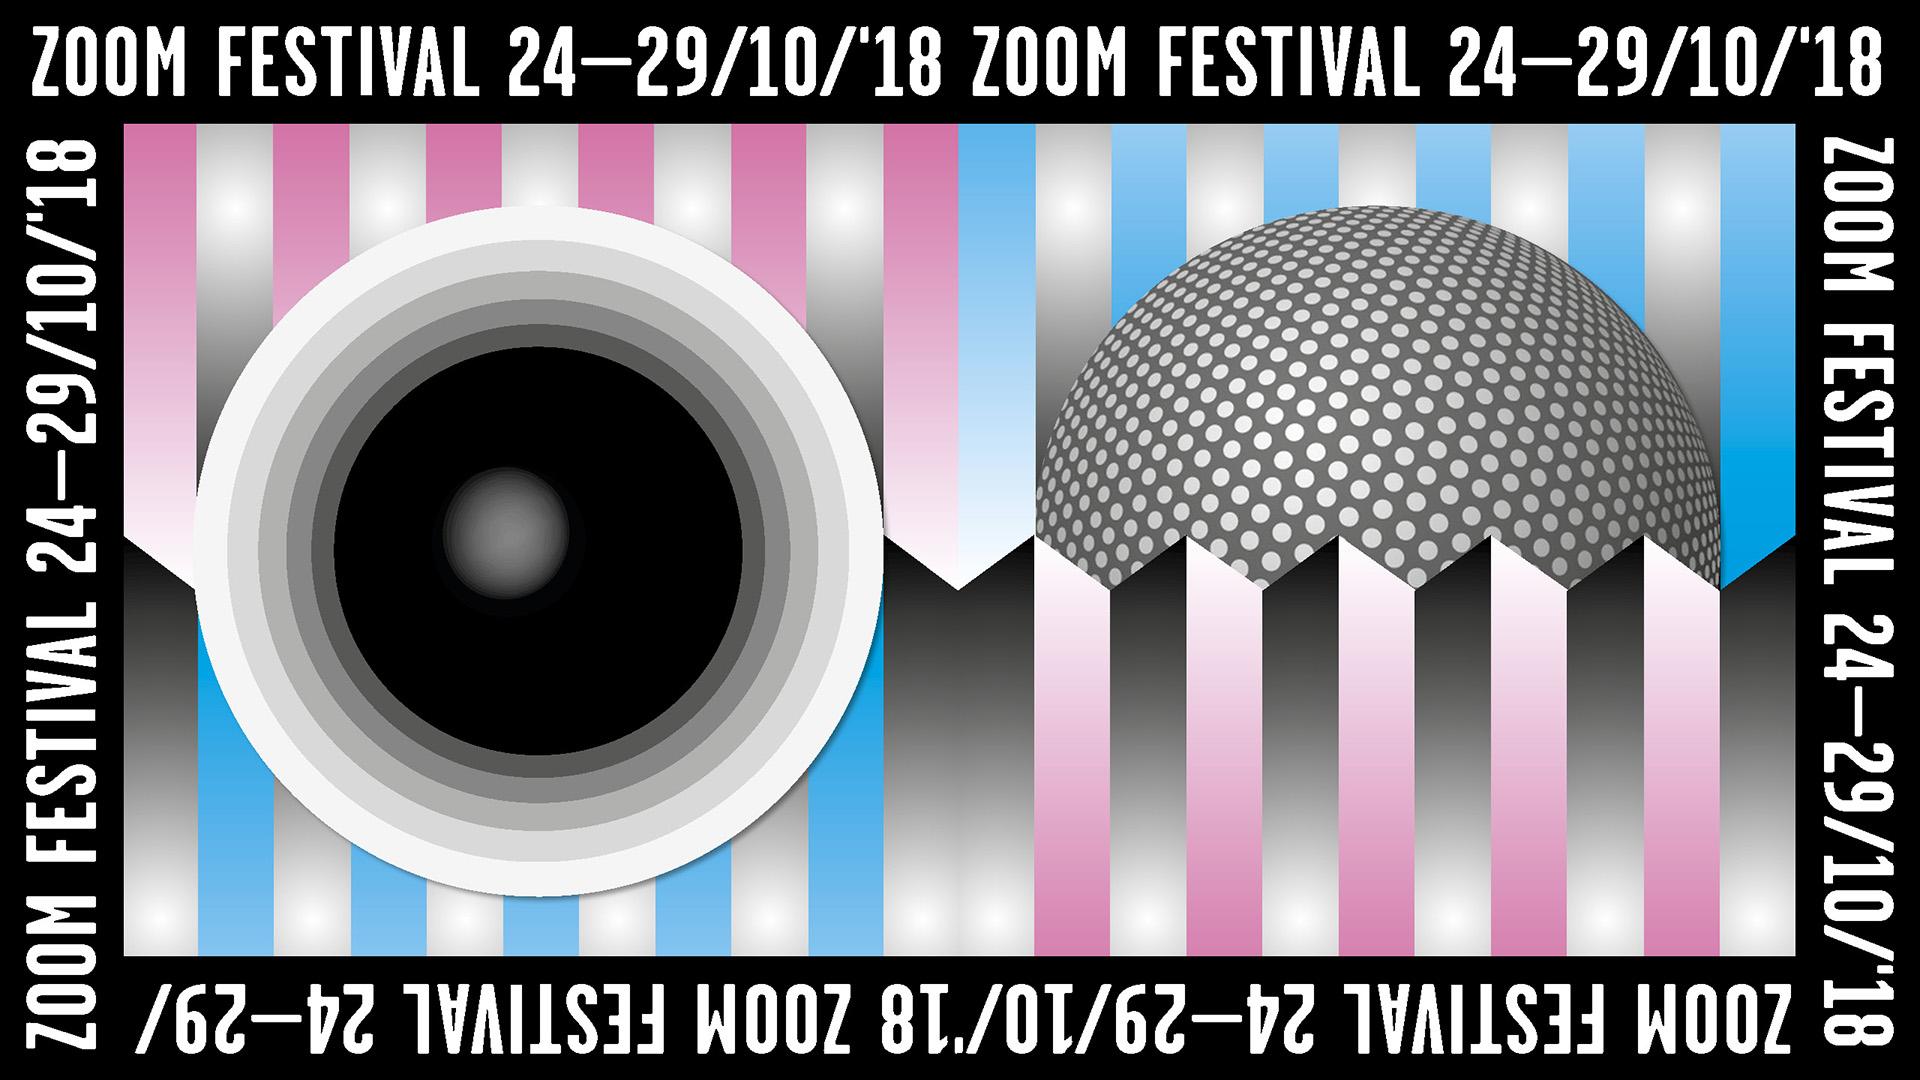 Zoom festival 2018 u Rijeci